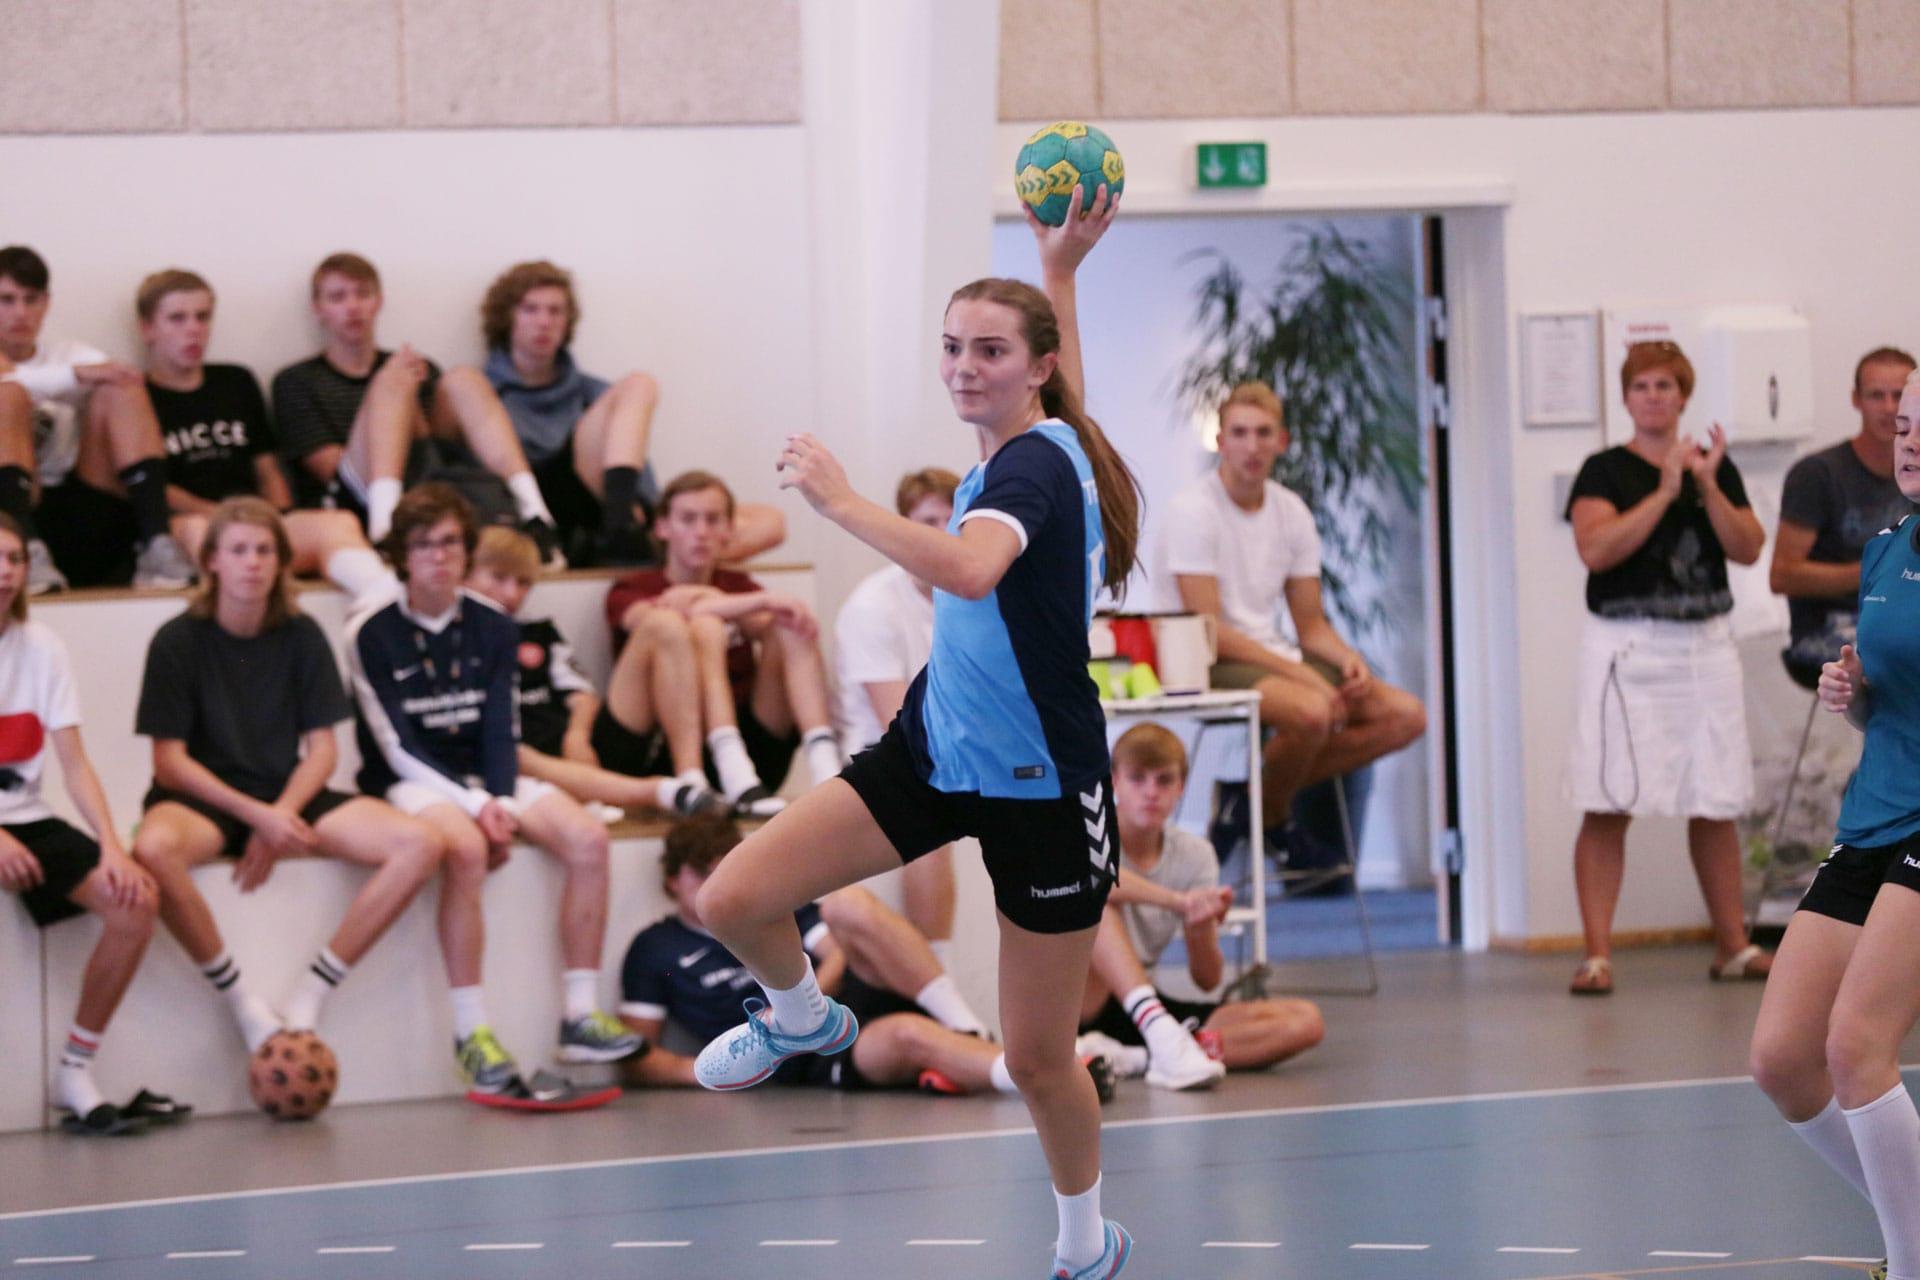 håndbold på en sportsefterskole